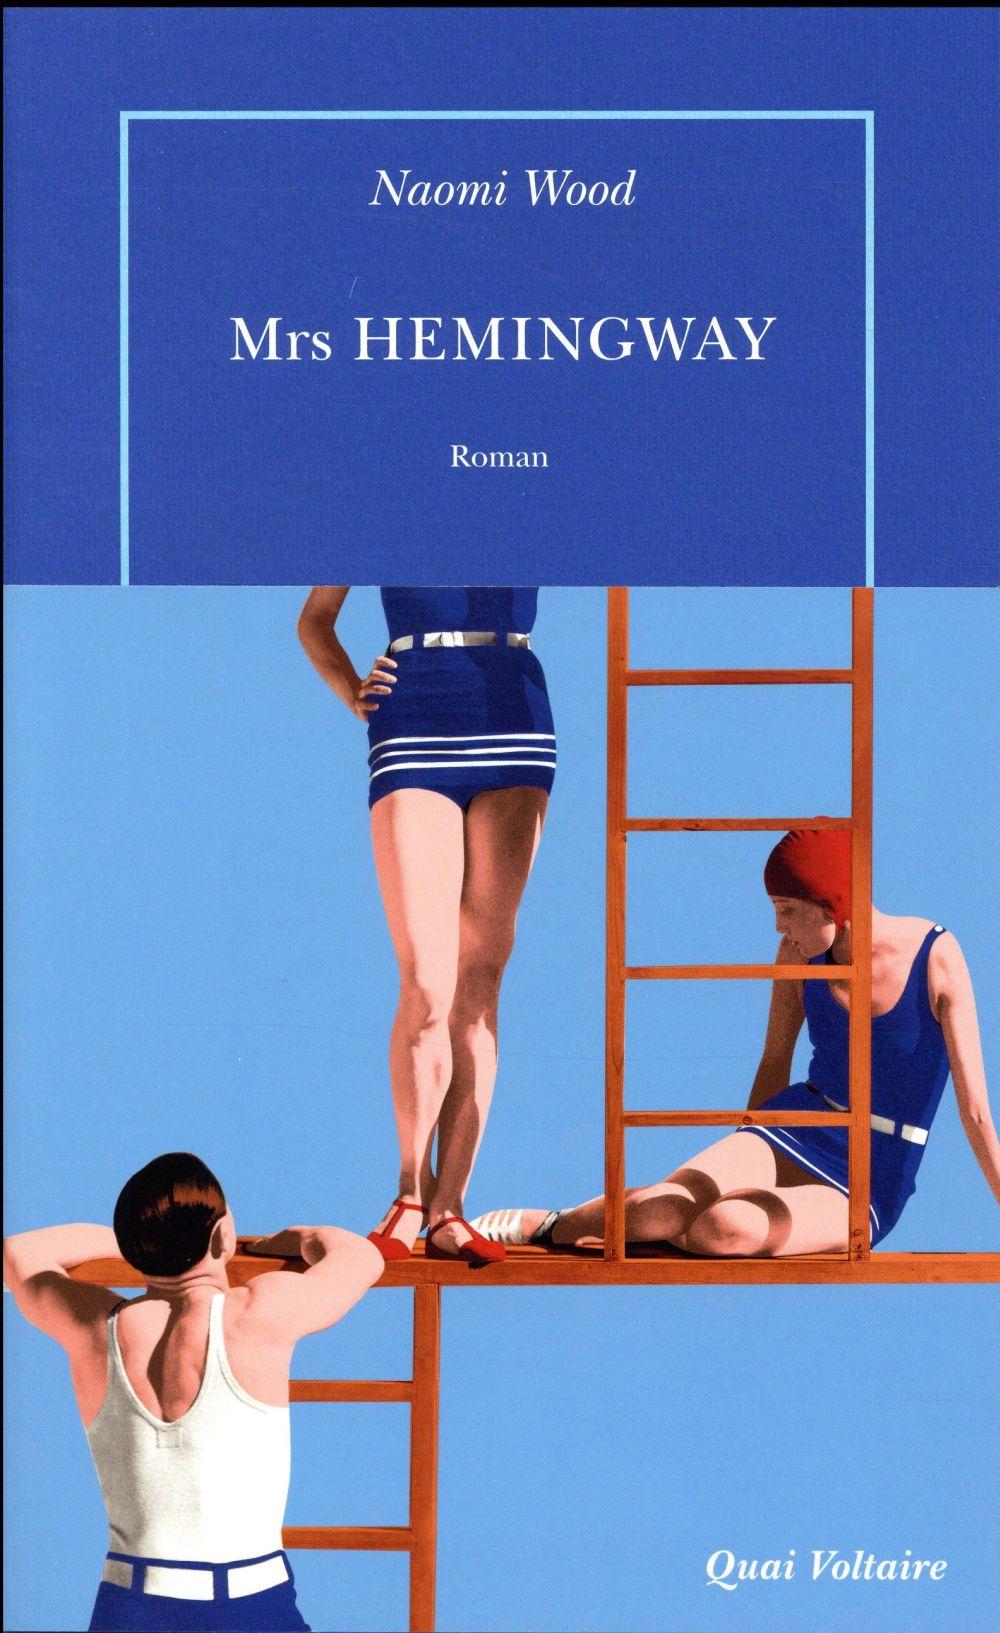 Wood Naomi - MRS HEMINGWAY